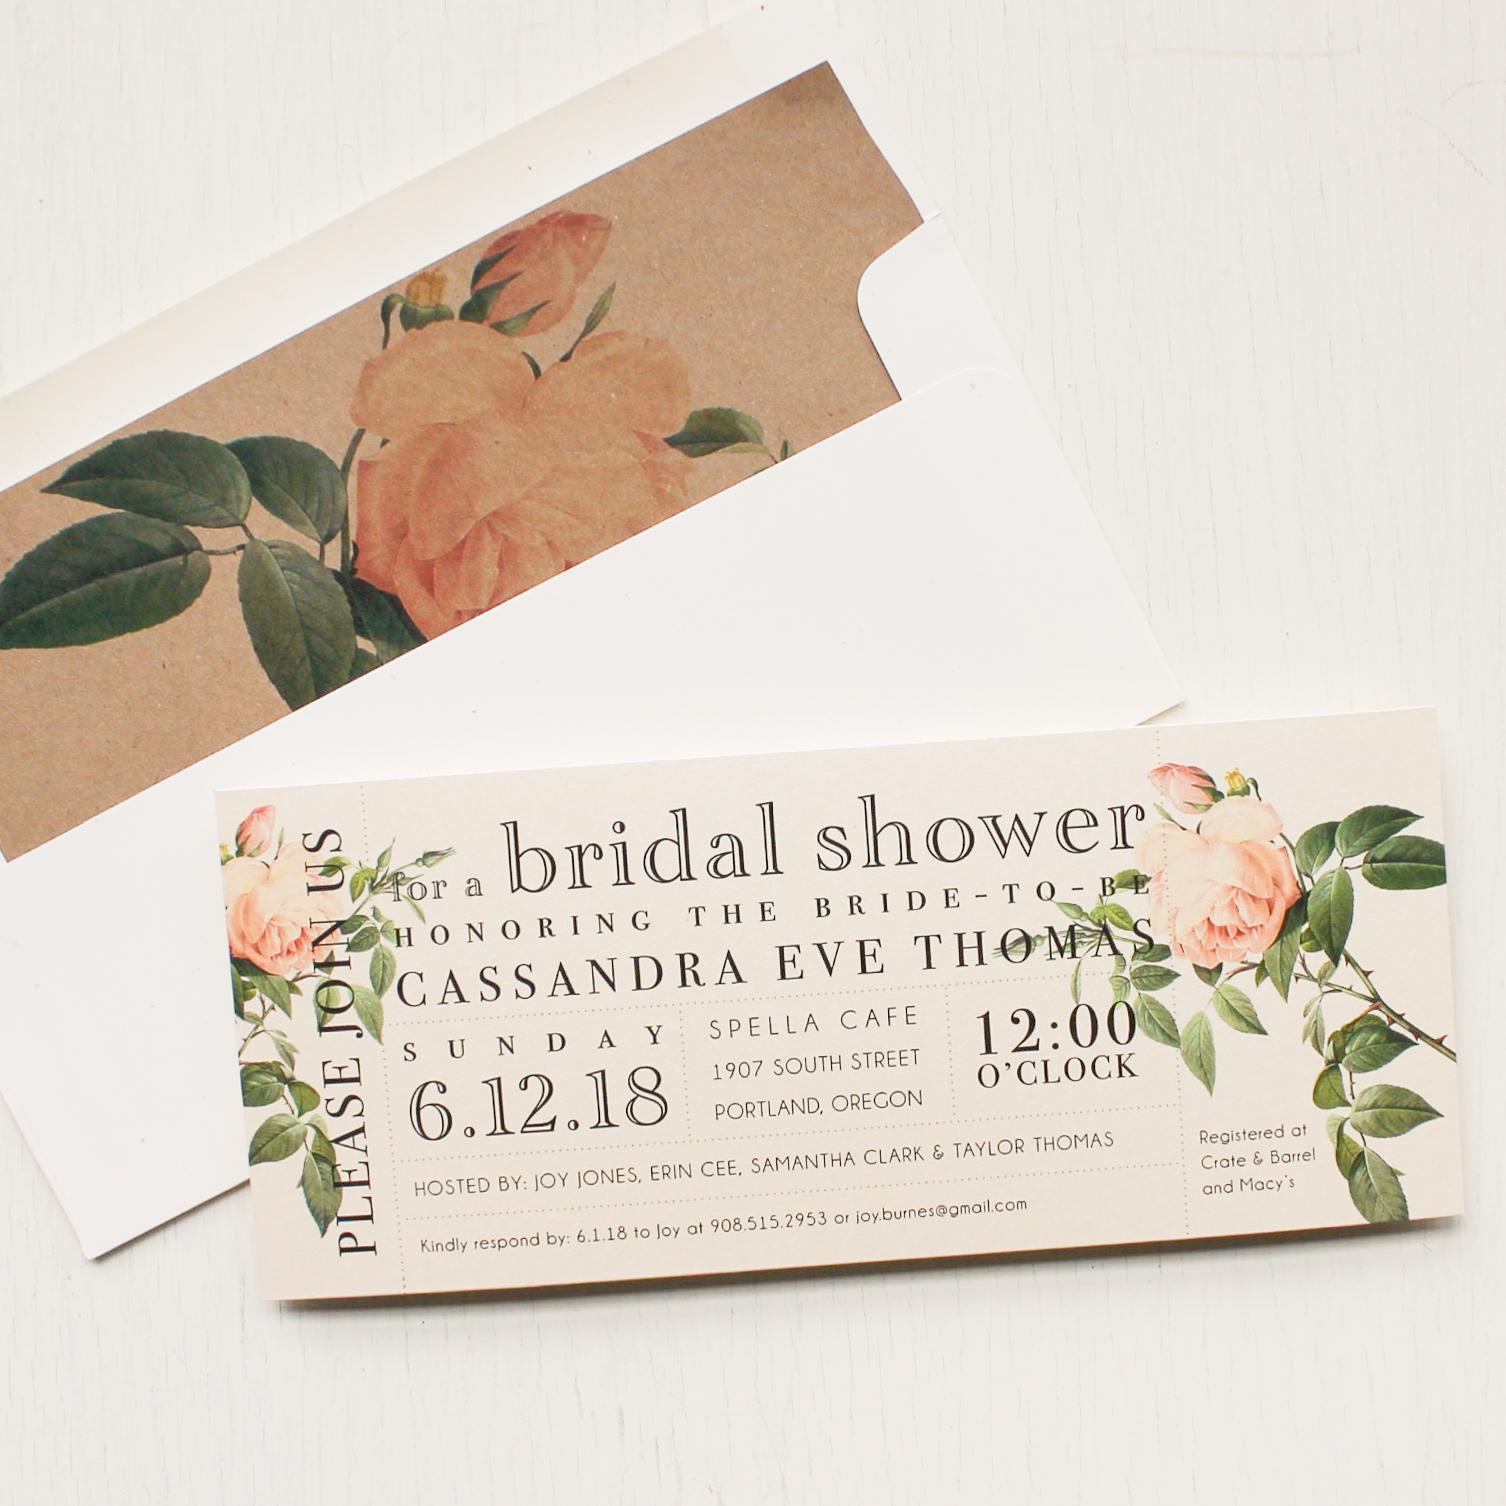 Ivory and Blush Bridal Shower Invitations